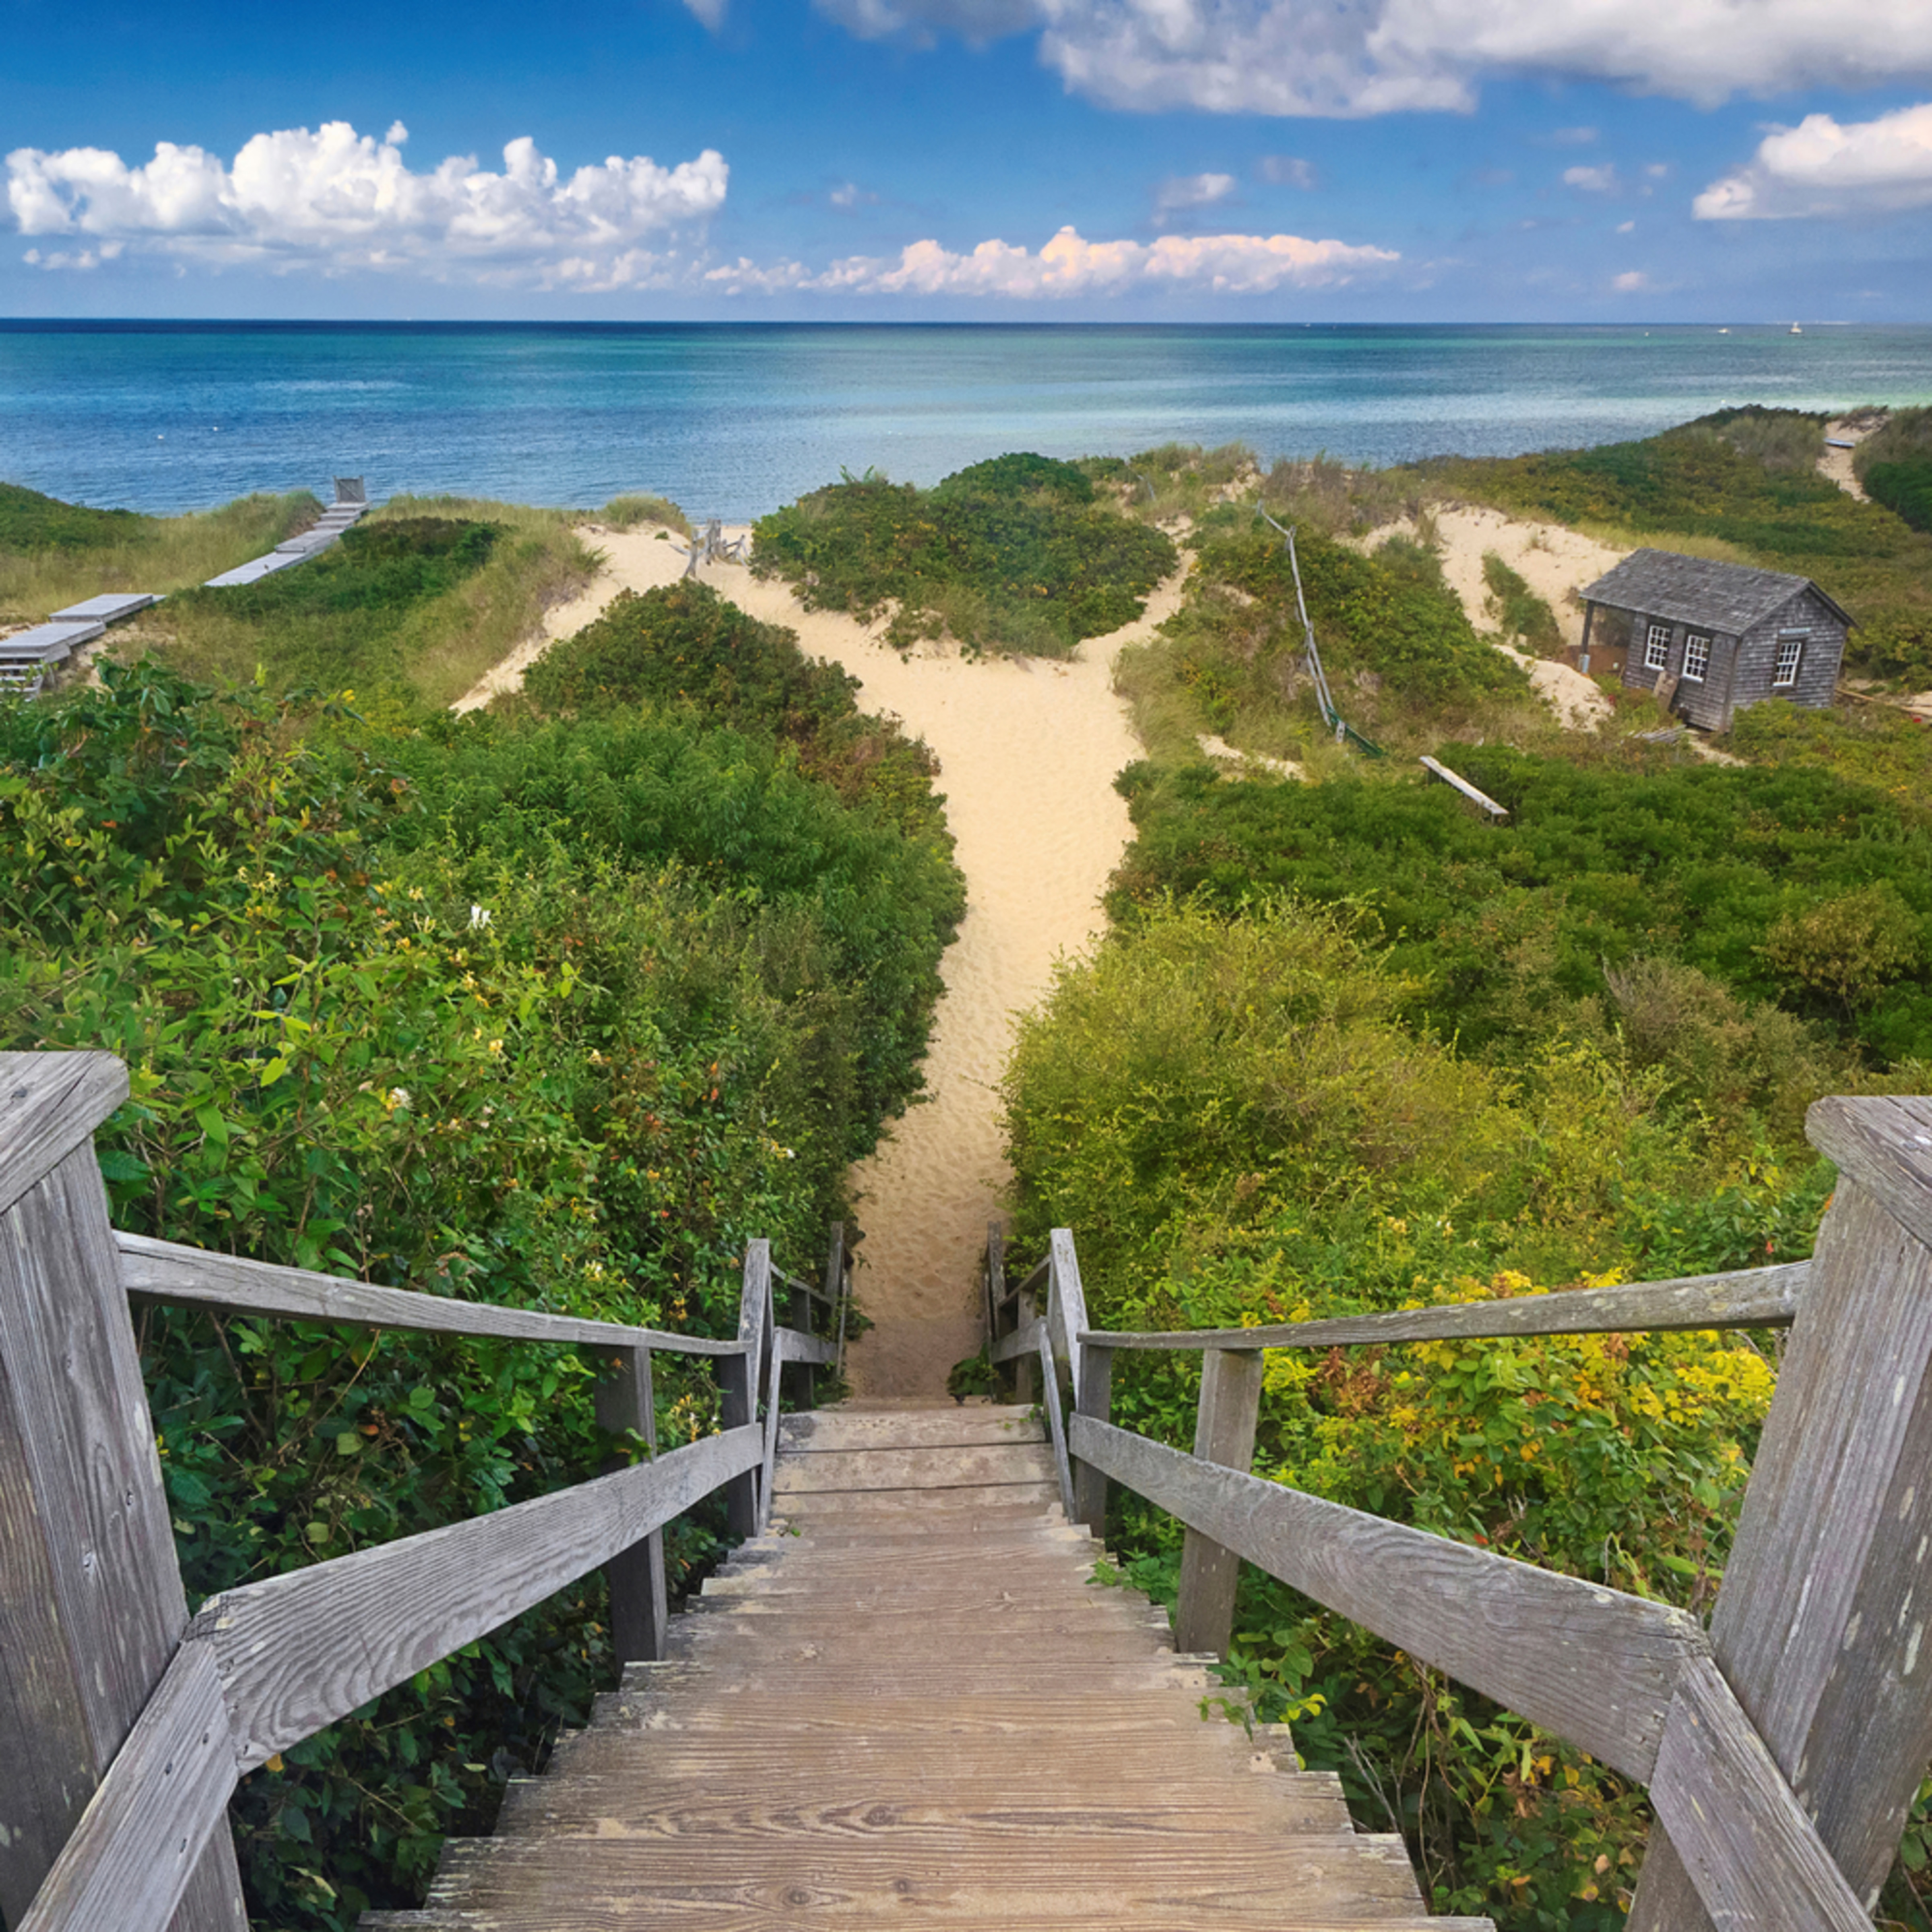 Steps beach nantucket large photo print msghkd